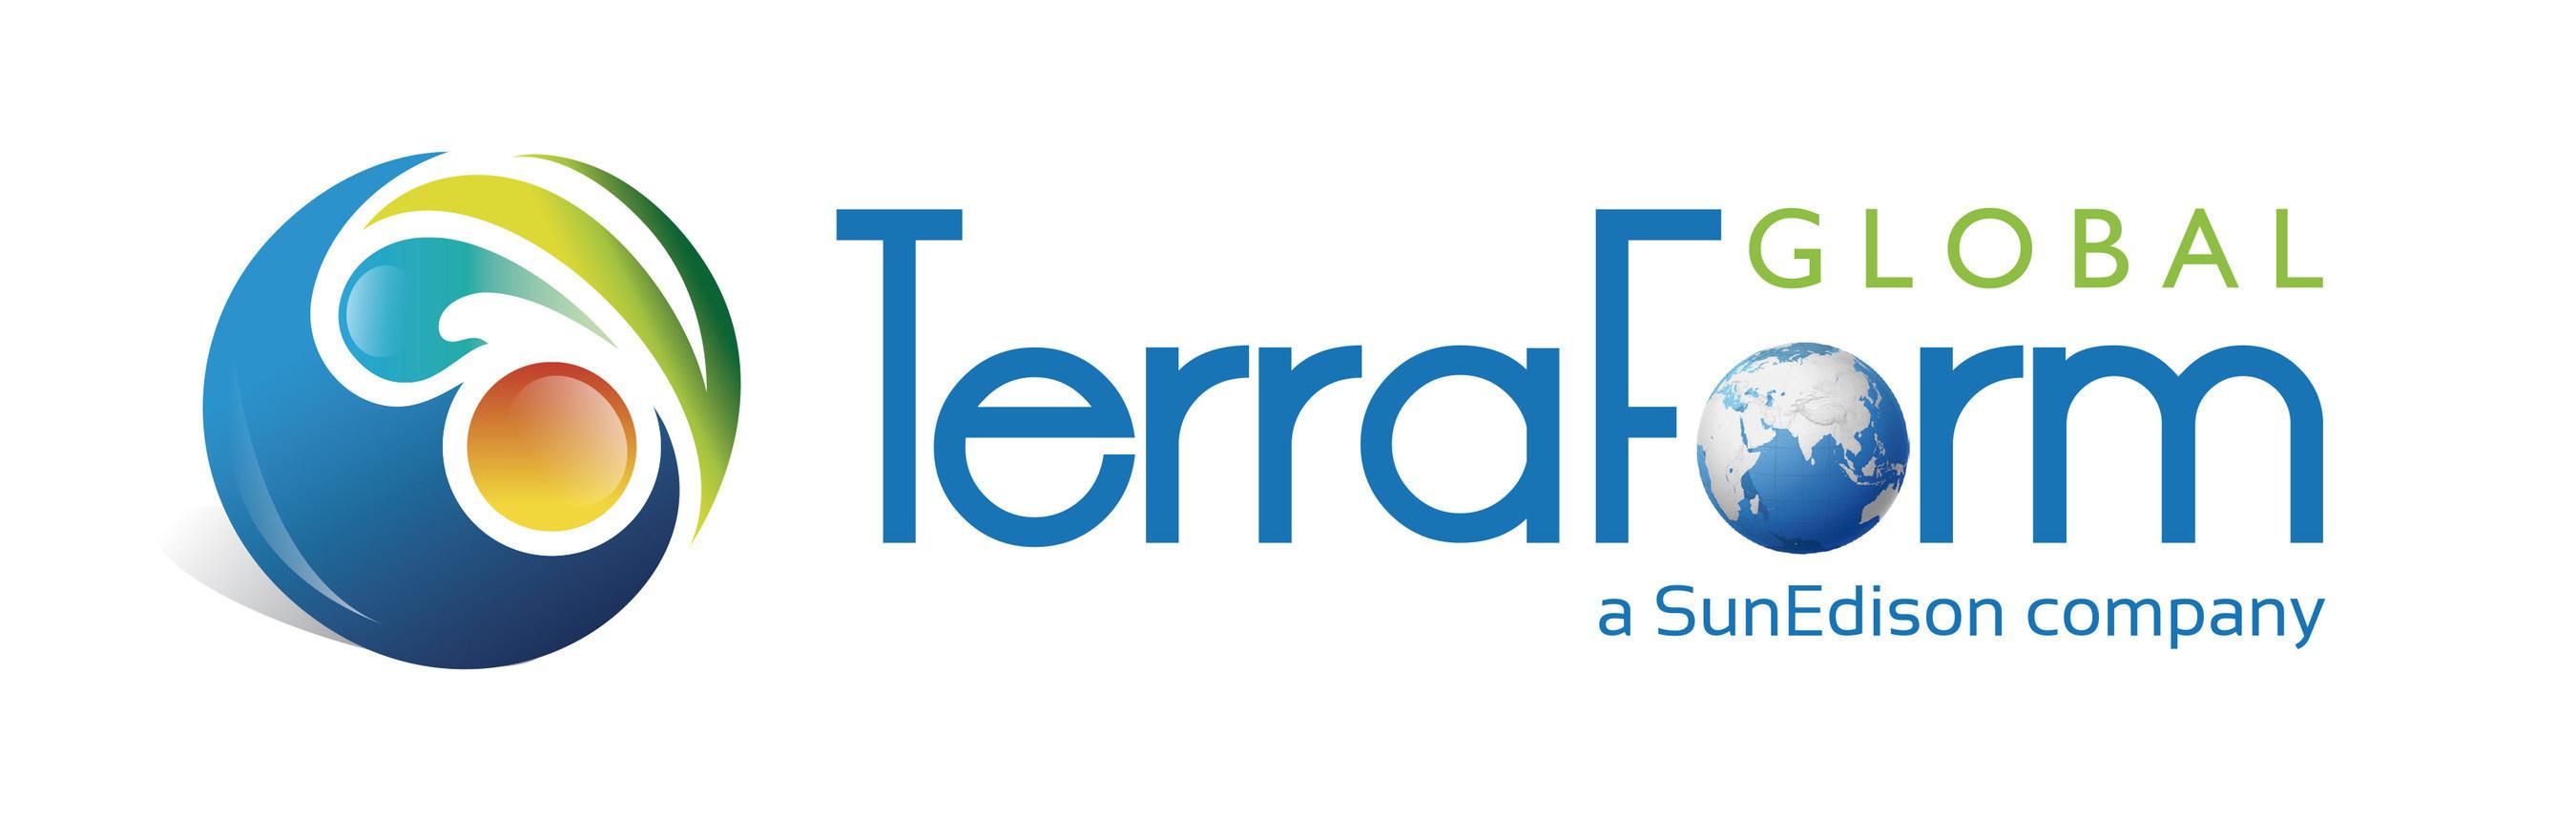 Sunedison inc announces pricing of initial public offering of terraform global inc logo biocorpaavc Choice Image